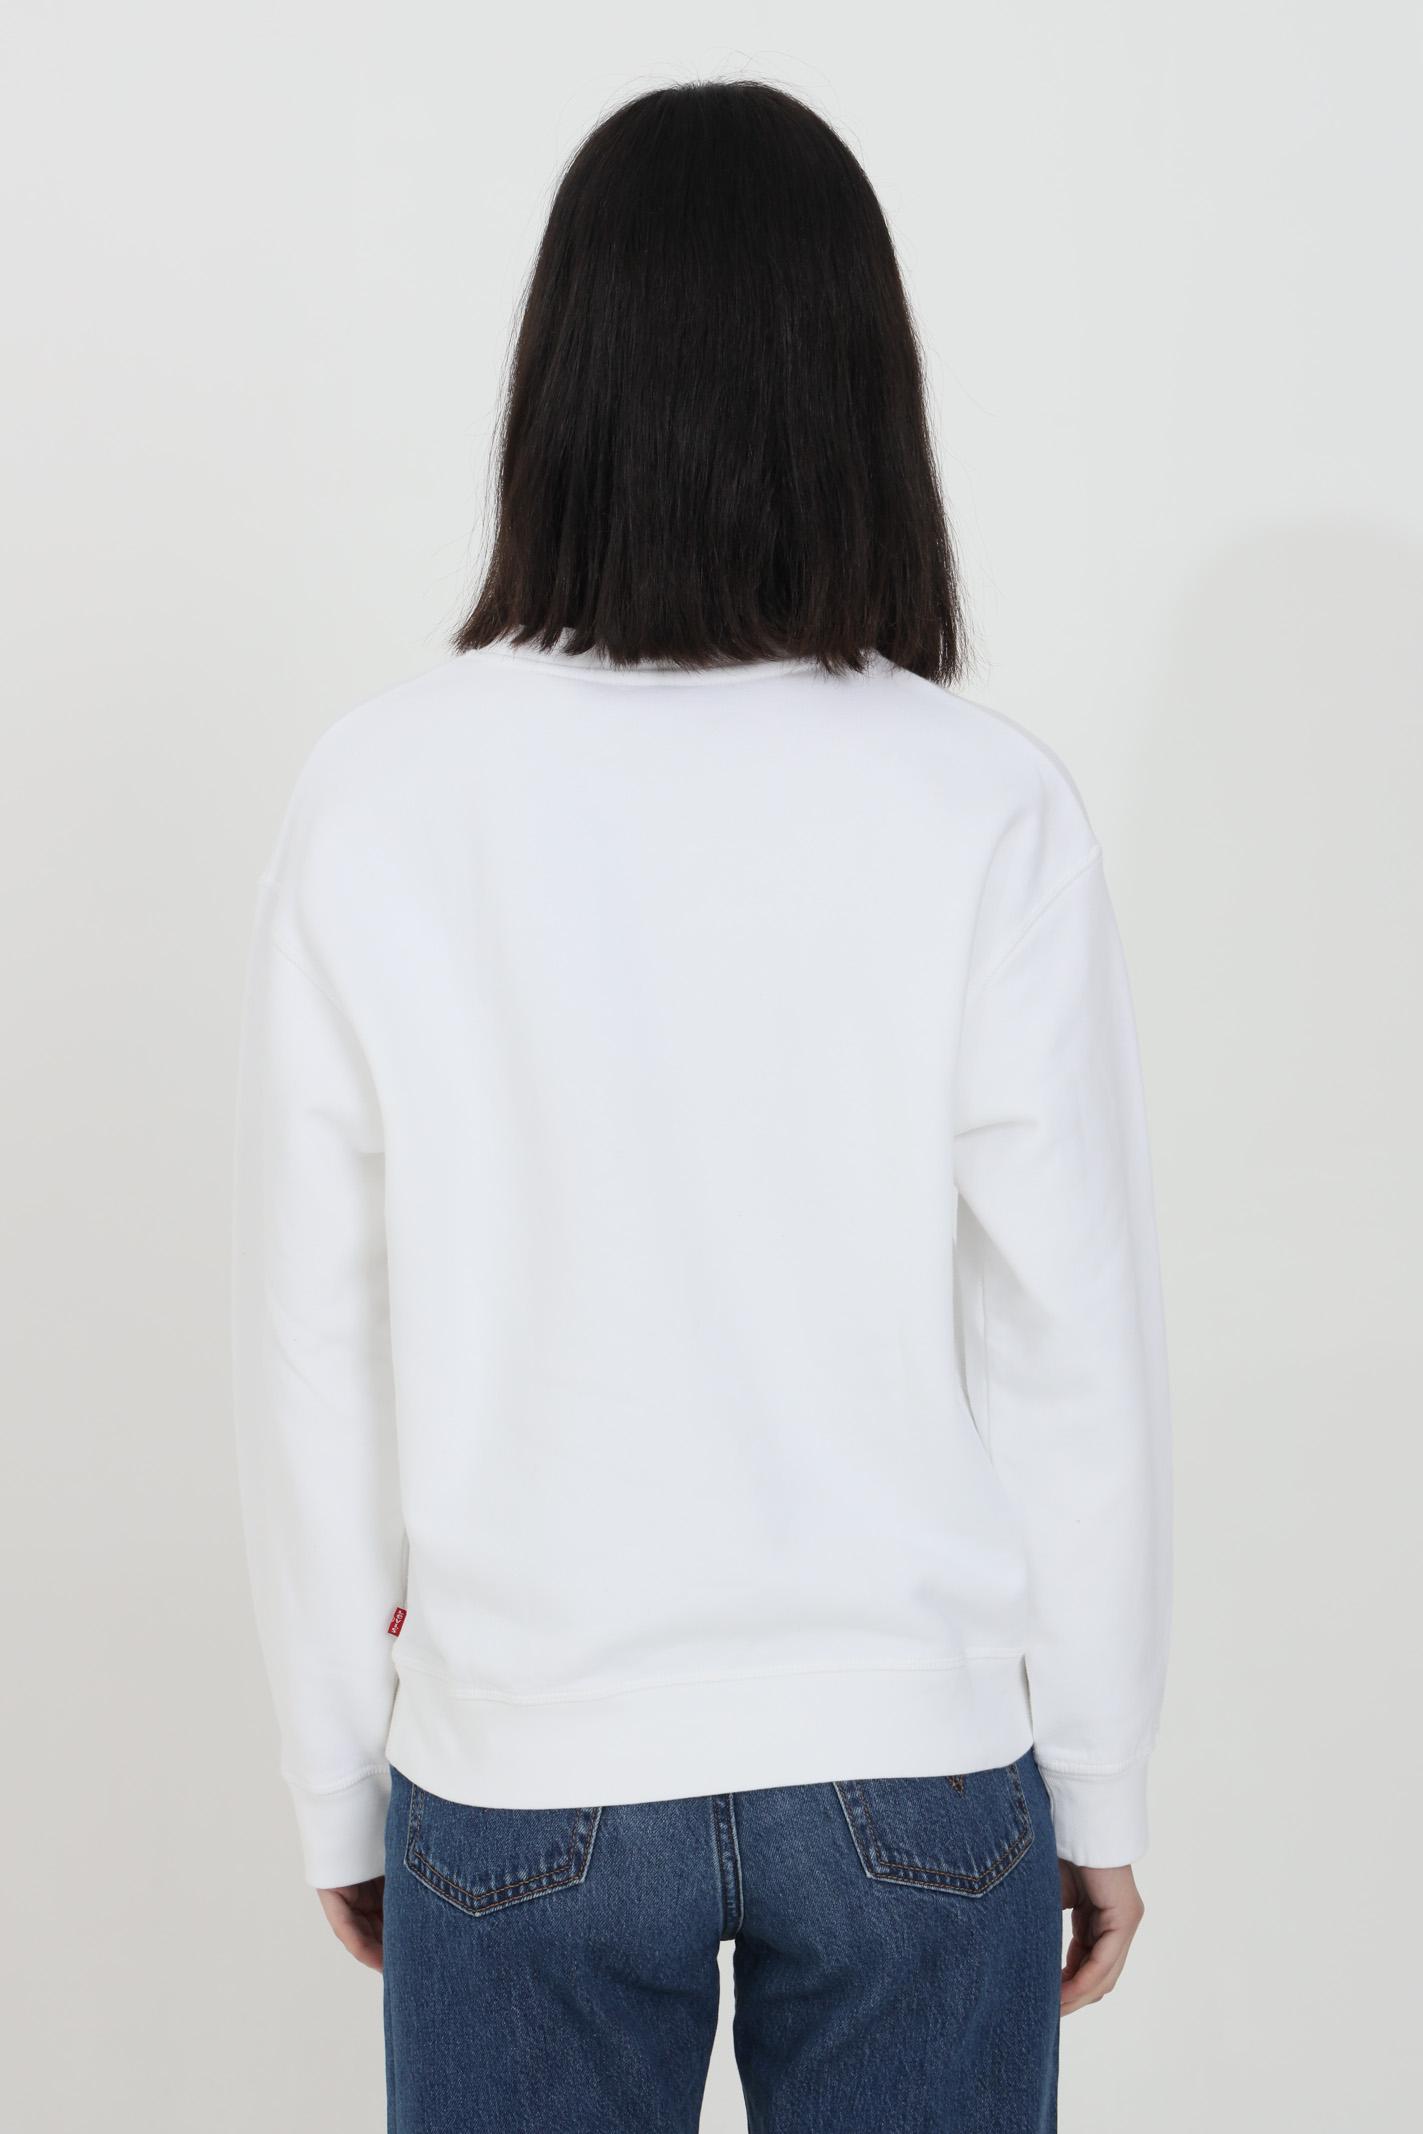 Crew neck sweatshirt with front logo LEVI'S | Sweatshirt | 18686-00040004